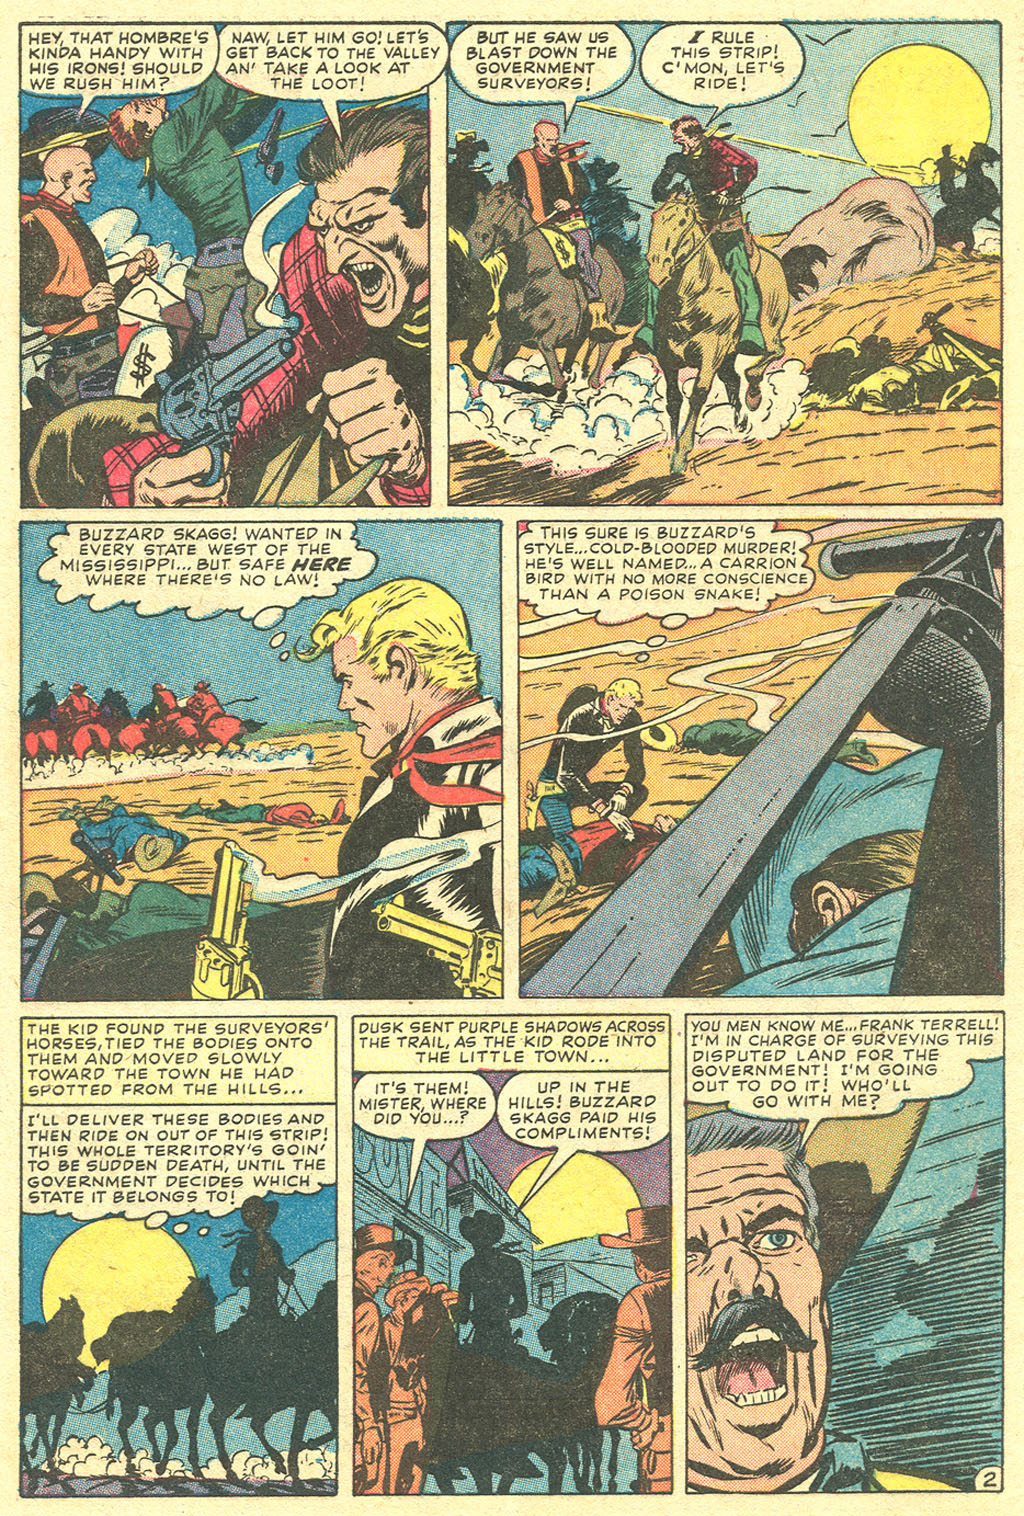 Read online Two-Gun Kid comic -  Issue #21 - 28